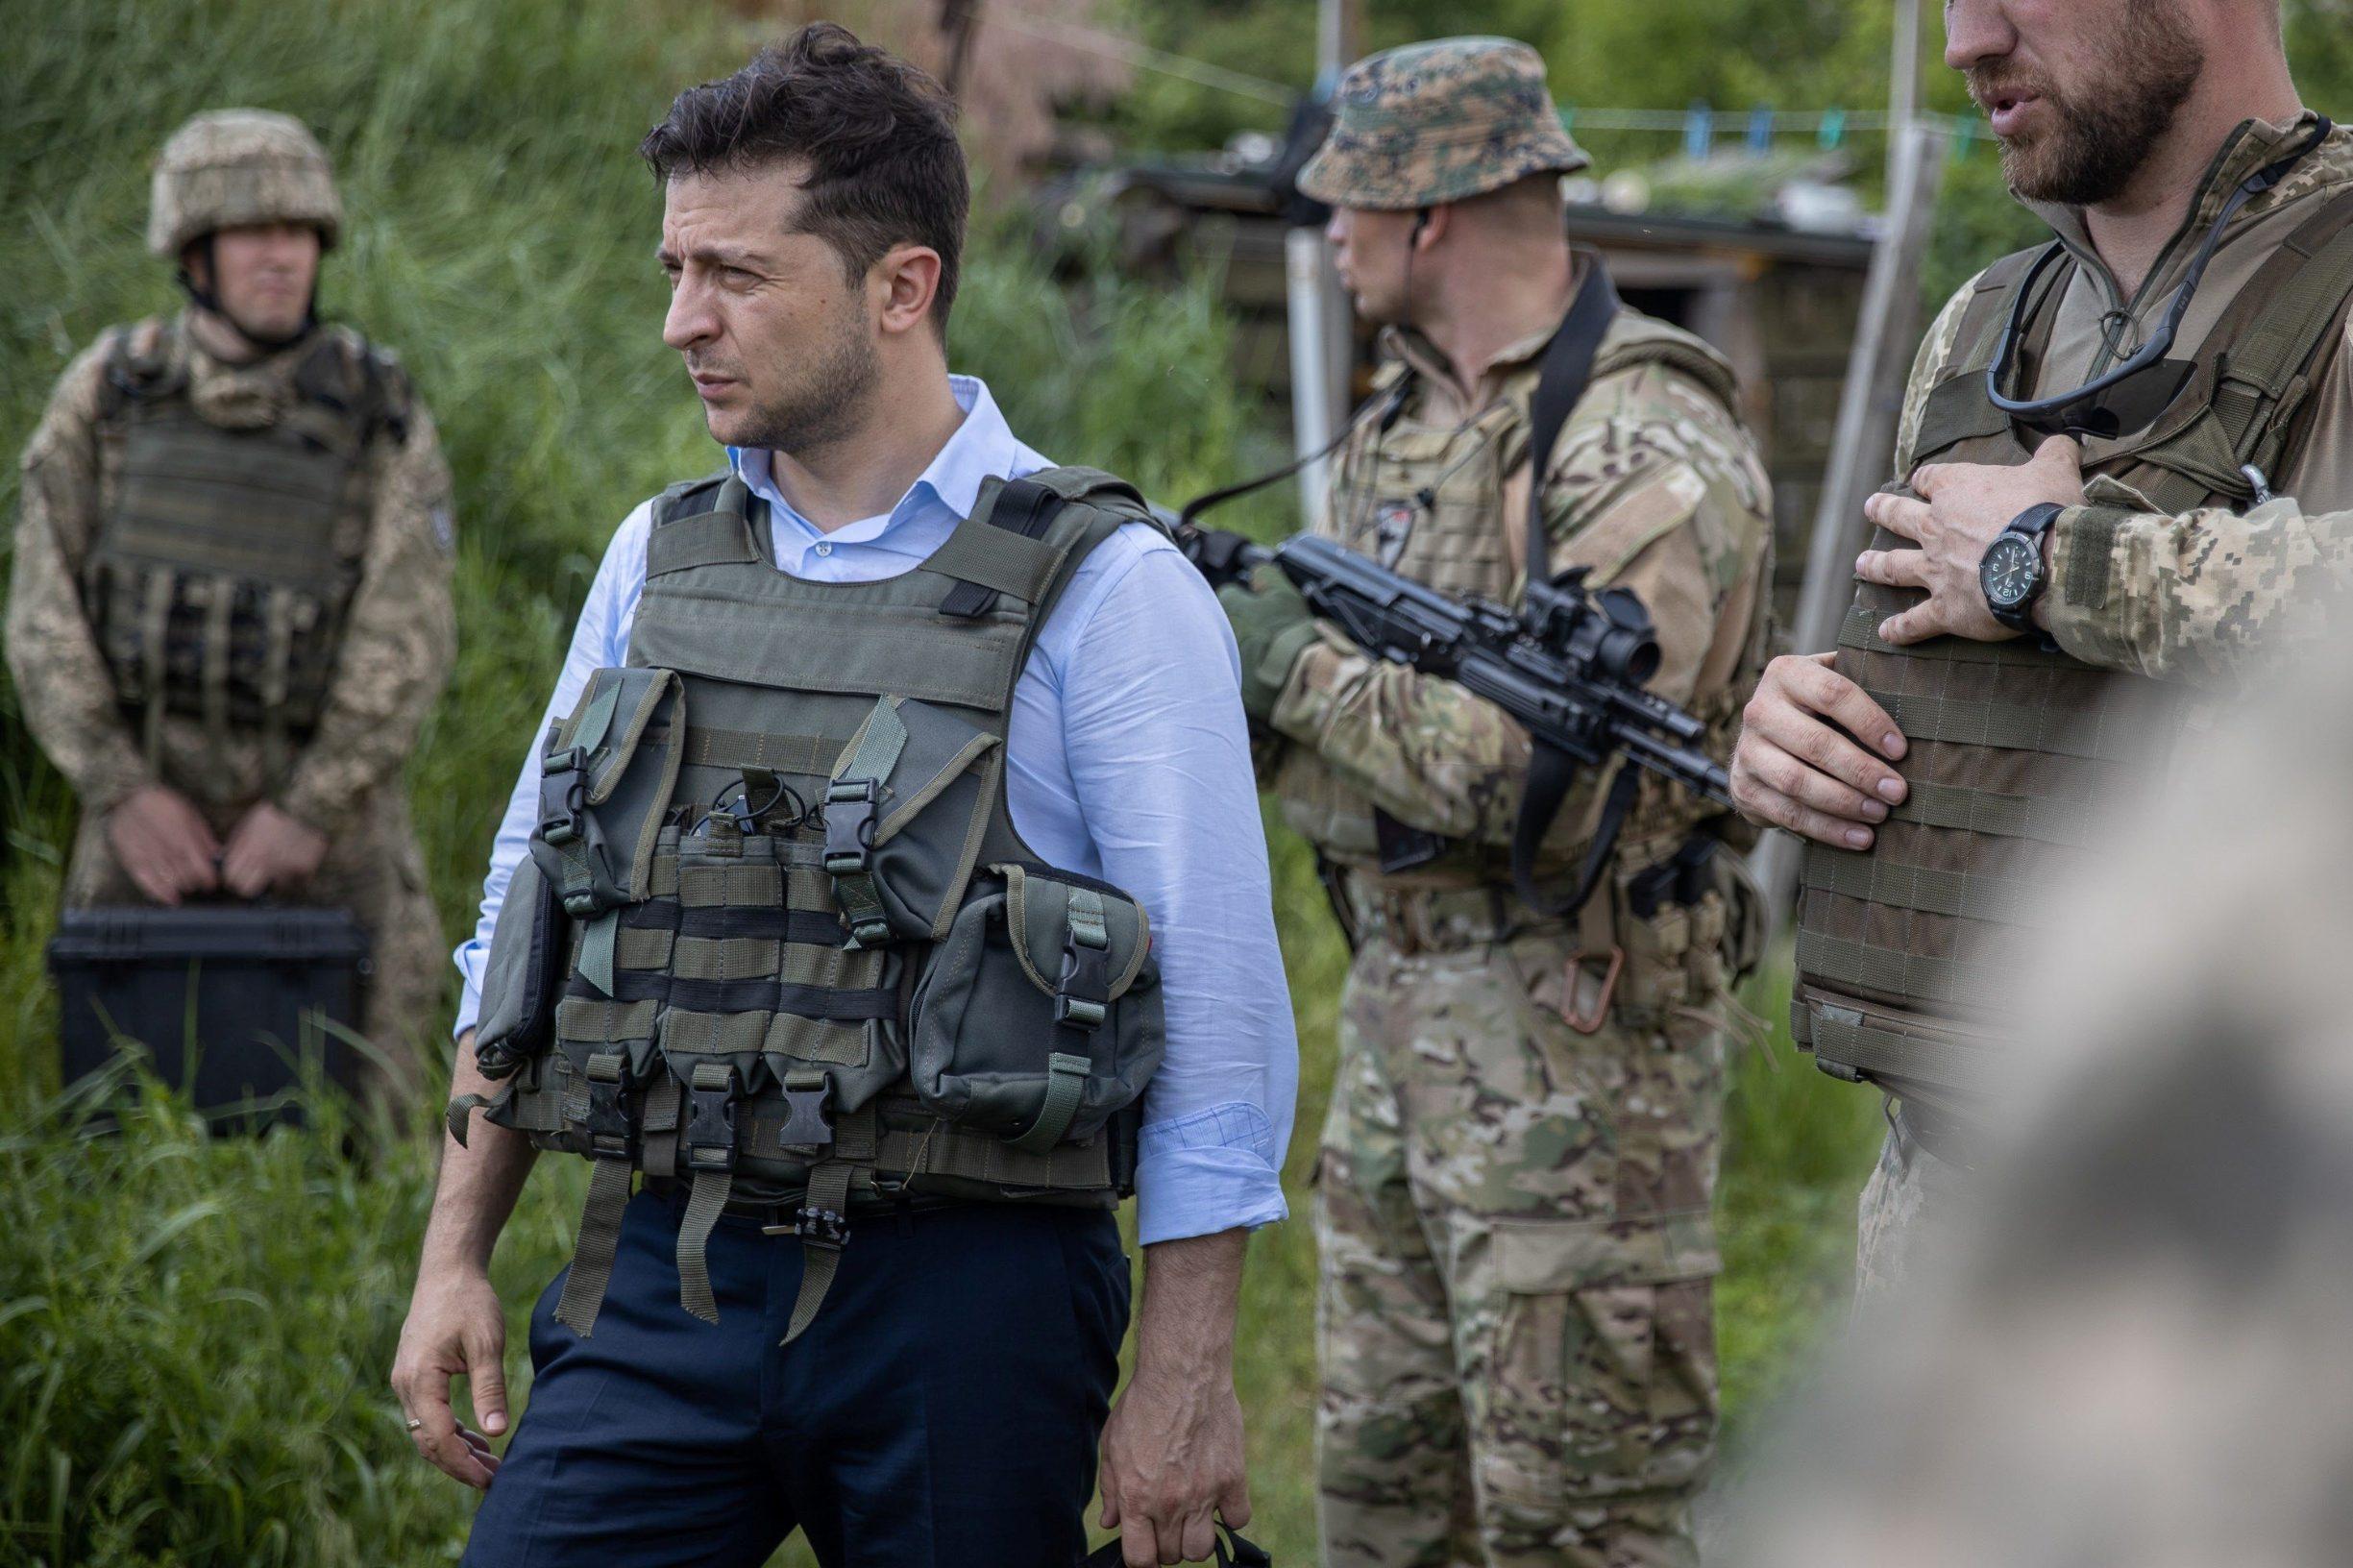 2019-05-27T172926Z_1701636131_RC1EE6DDB5A0_RTRMADP_3_UKRAINE-CRISIS-ZELENSKIY-FRONTLINE